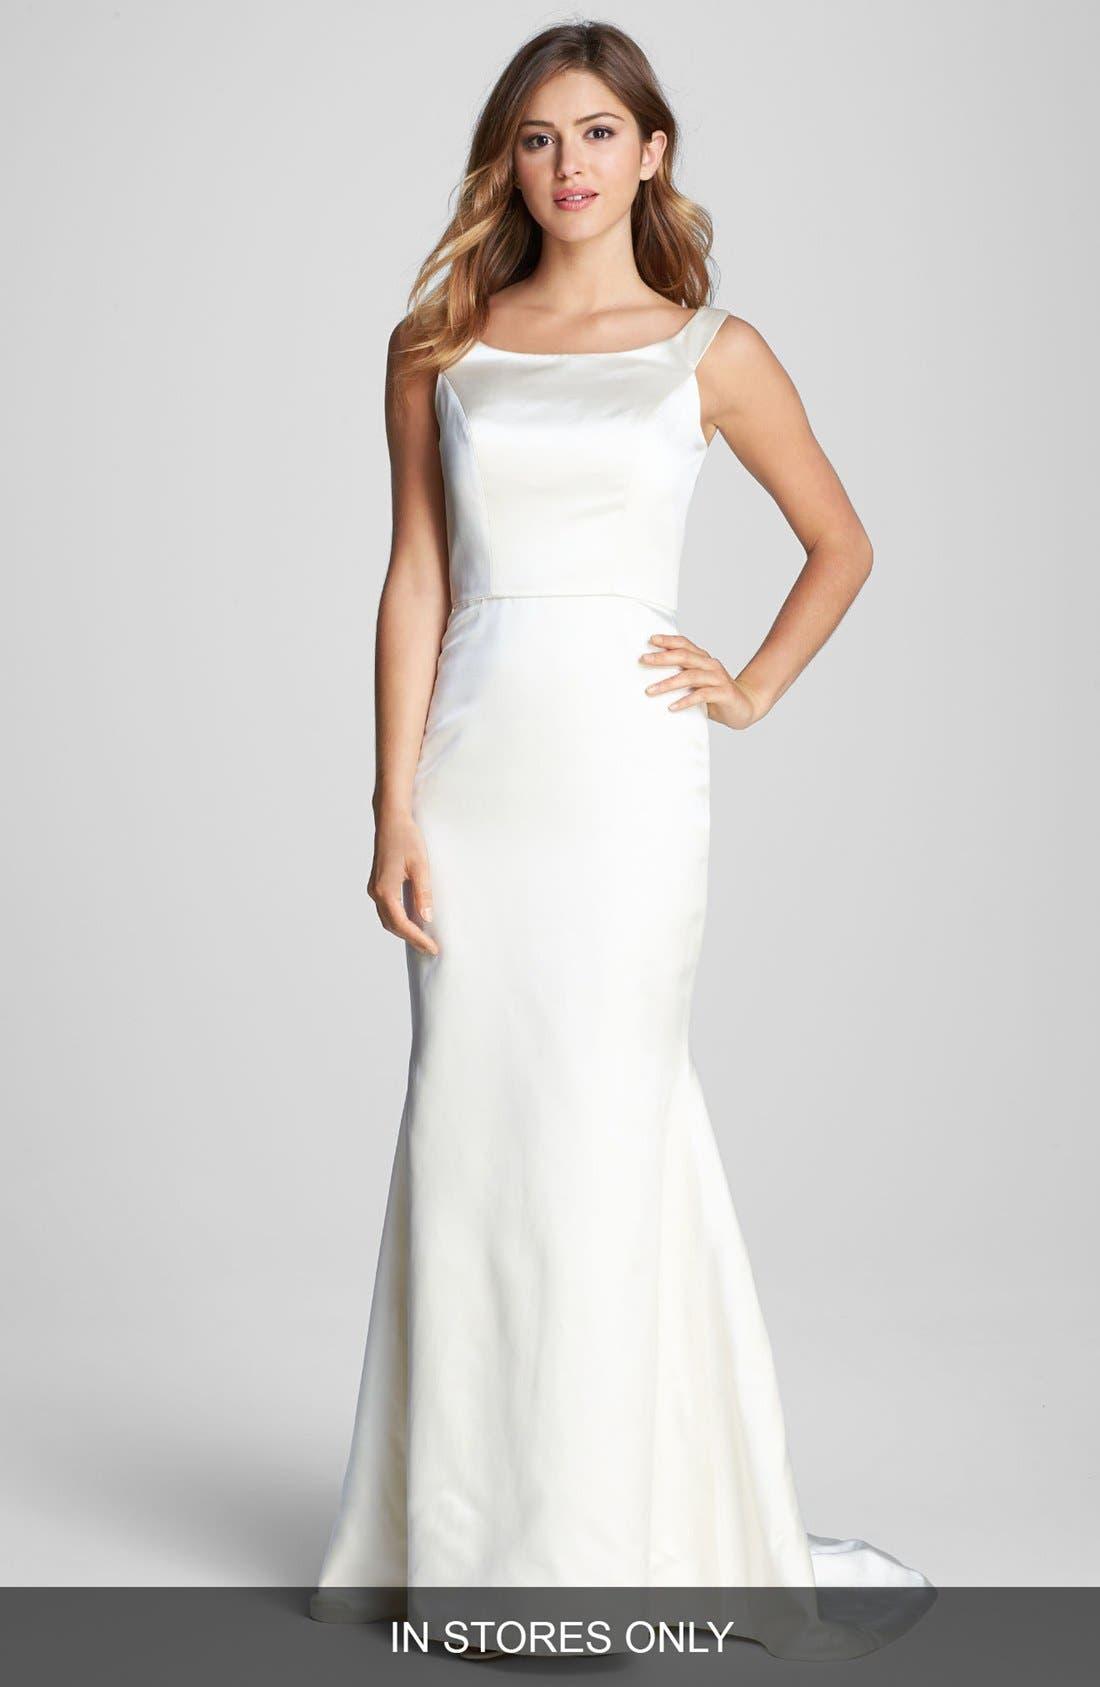 Alternate Image 1 Selected - Caroline DeVillo 'Lauren' Silk Trumpet Dress (In Stores Only)